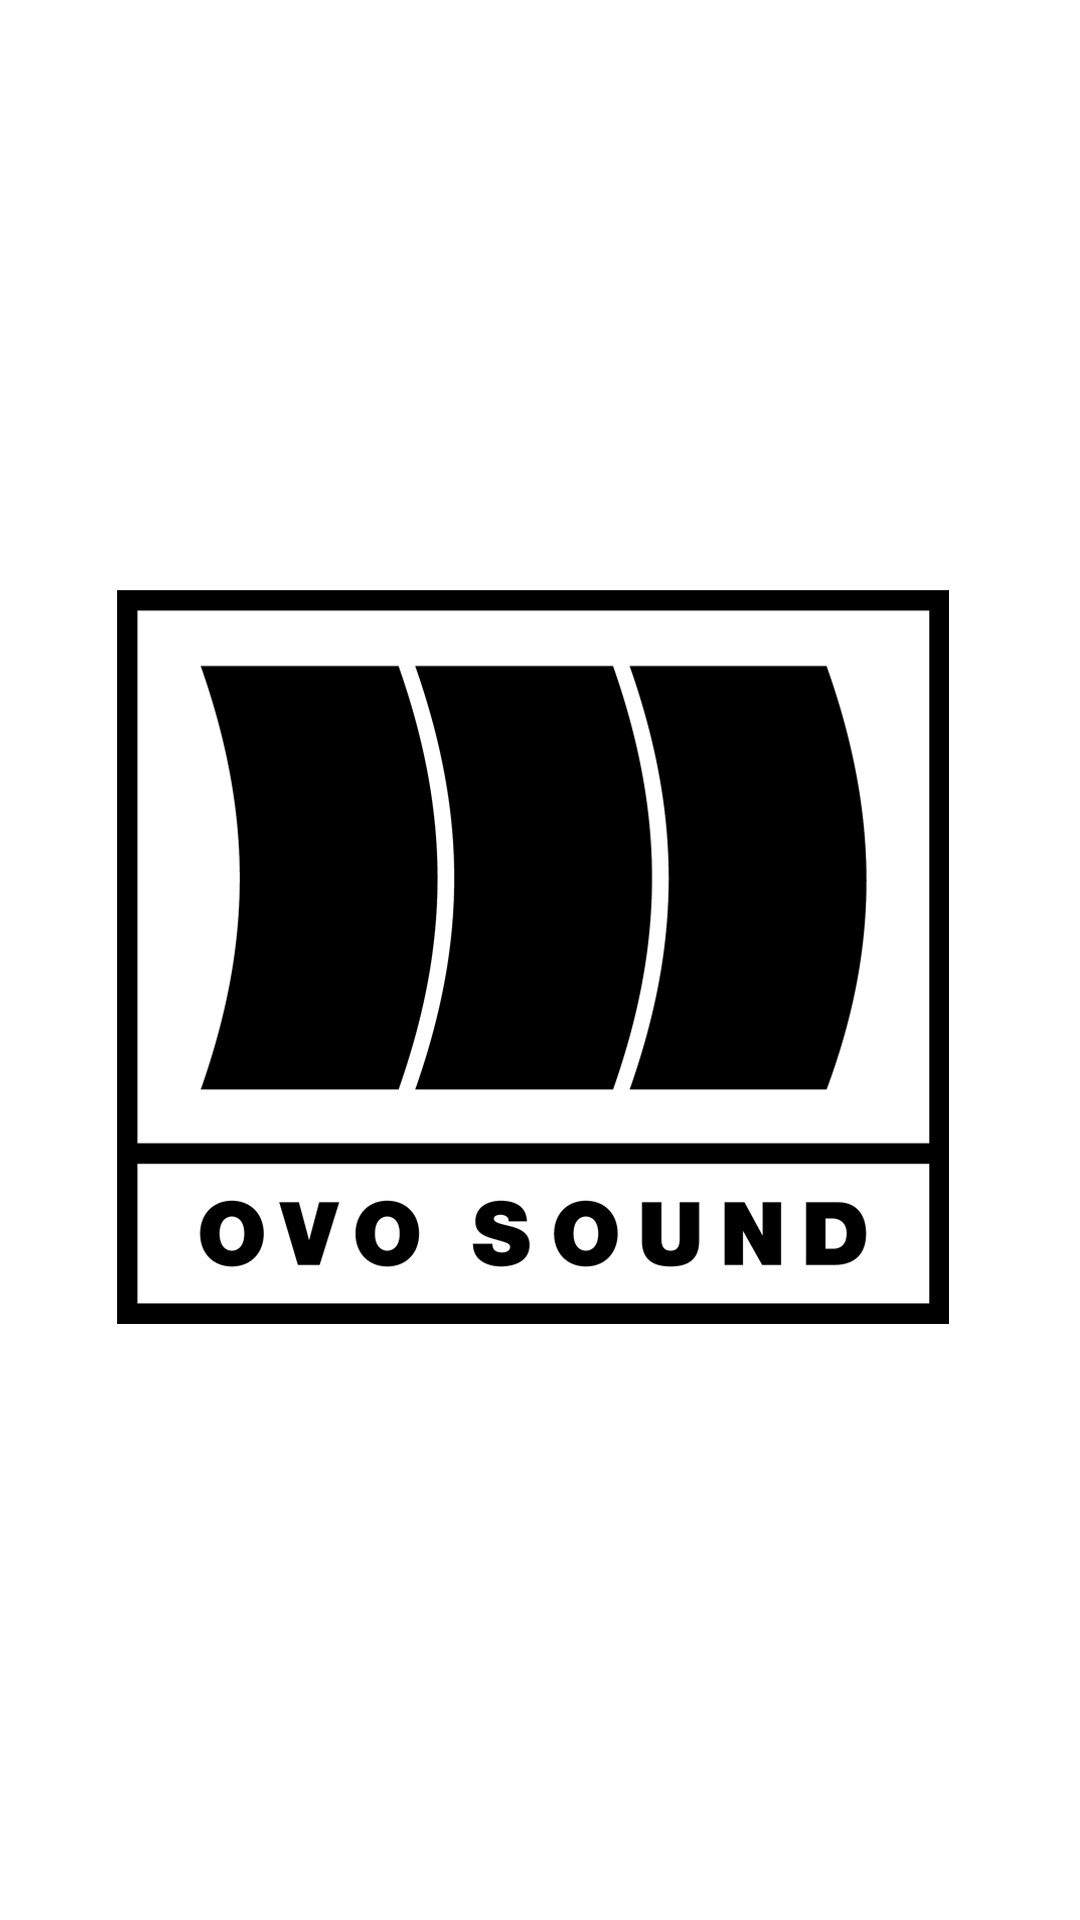 … OVO Sound Phone wallpaper HD 1920×1080 by manbearpagan